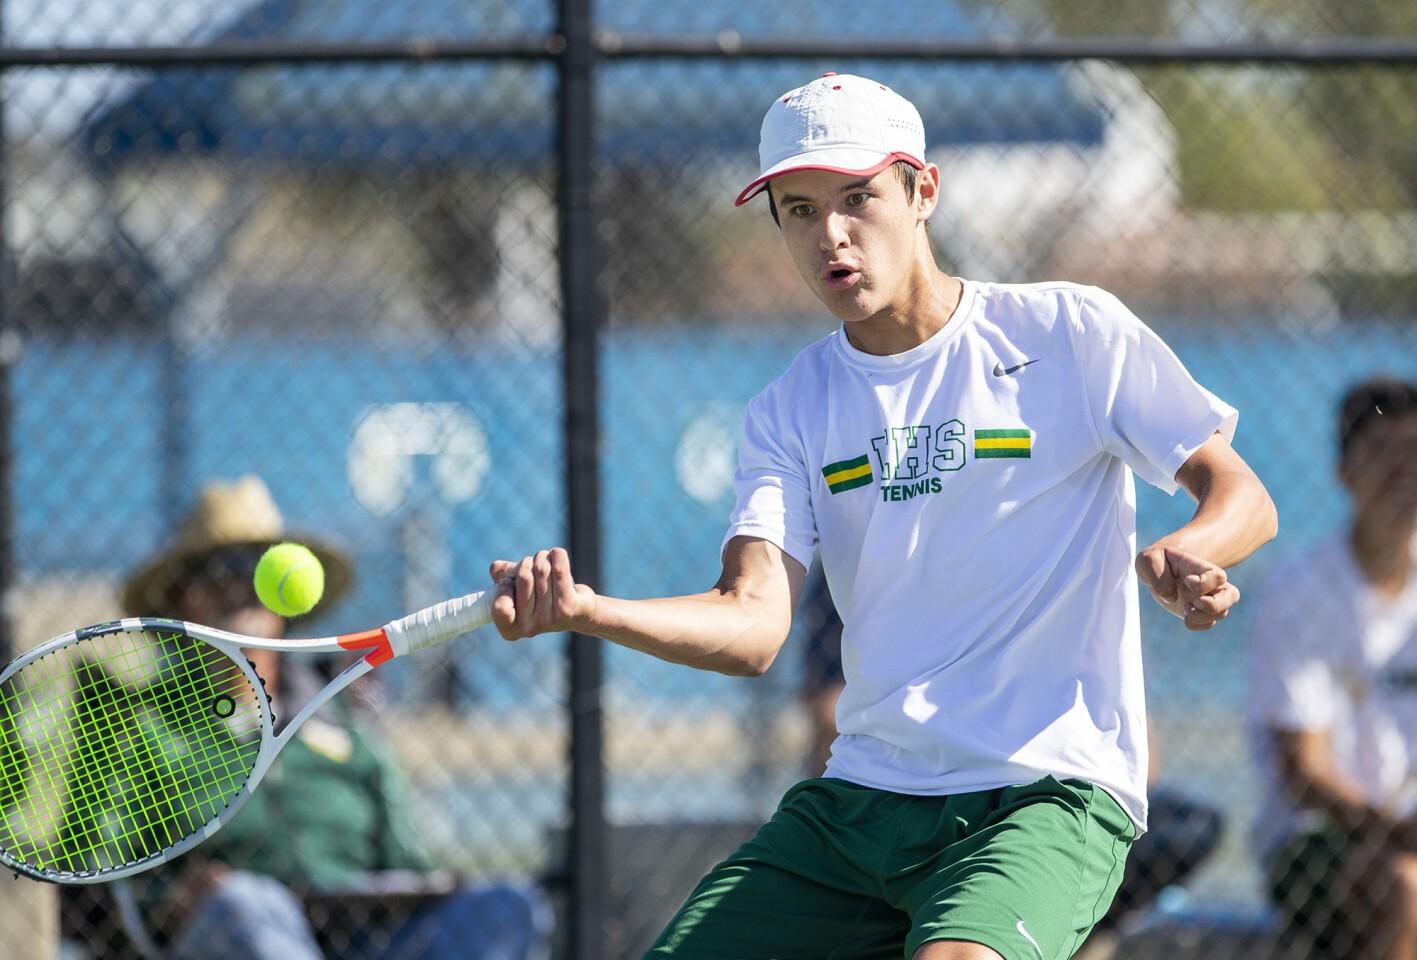 Photo Gallery: Edison vs. Newport Harbor in boys' tennis